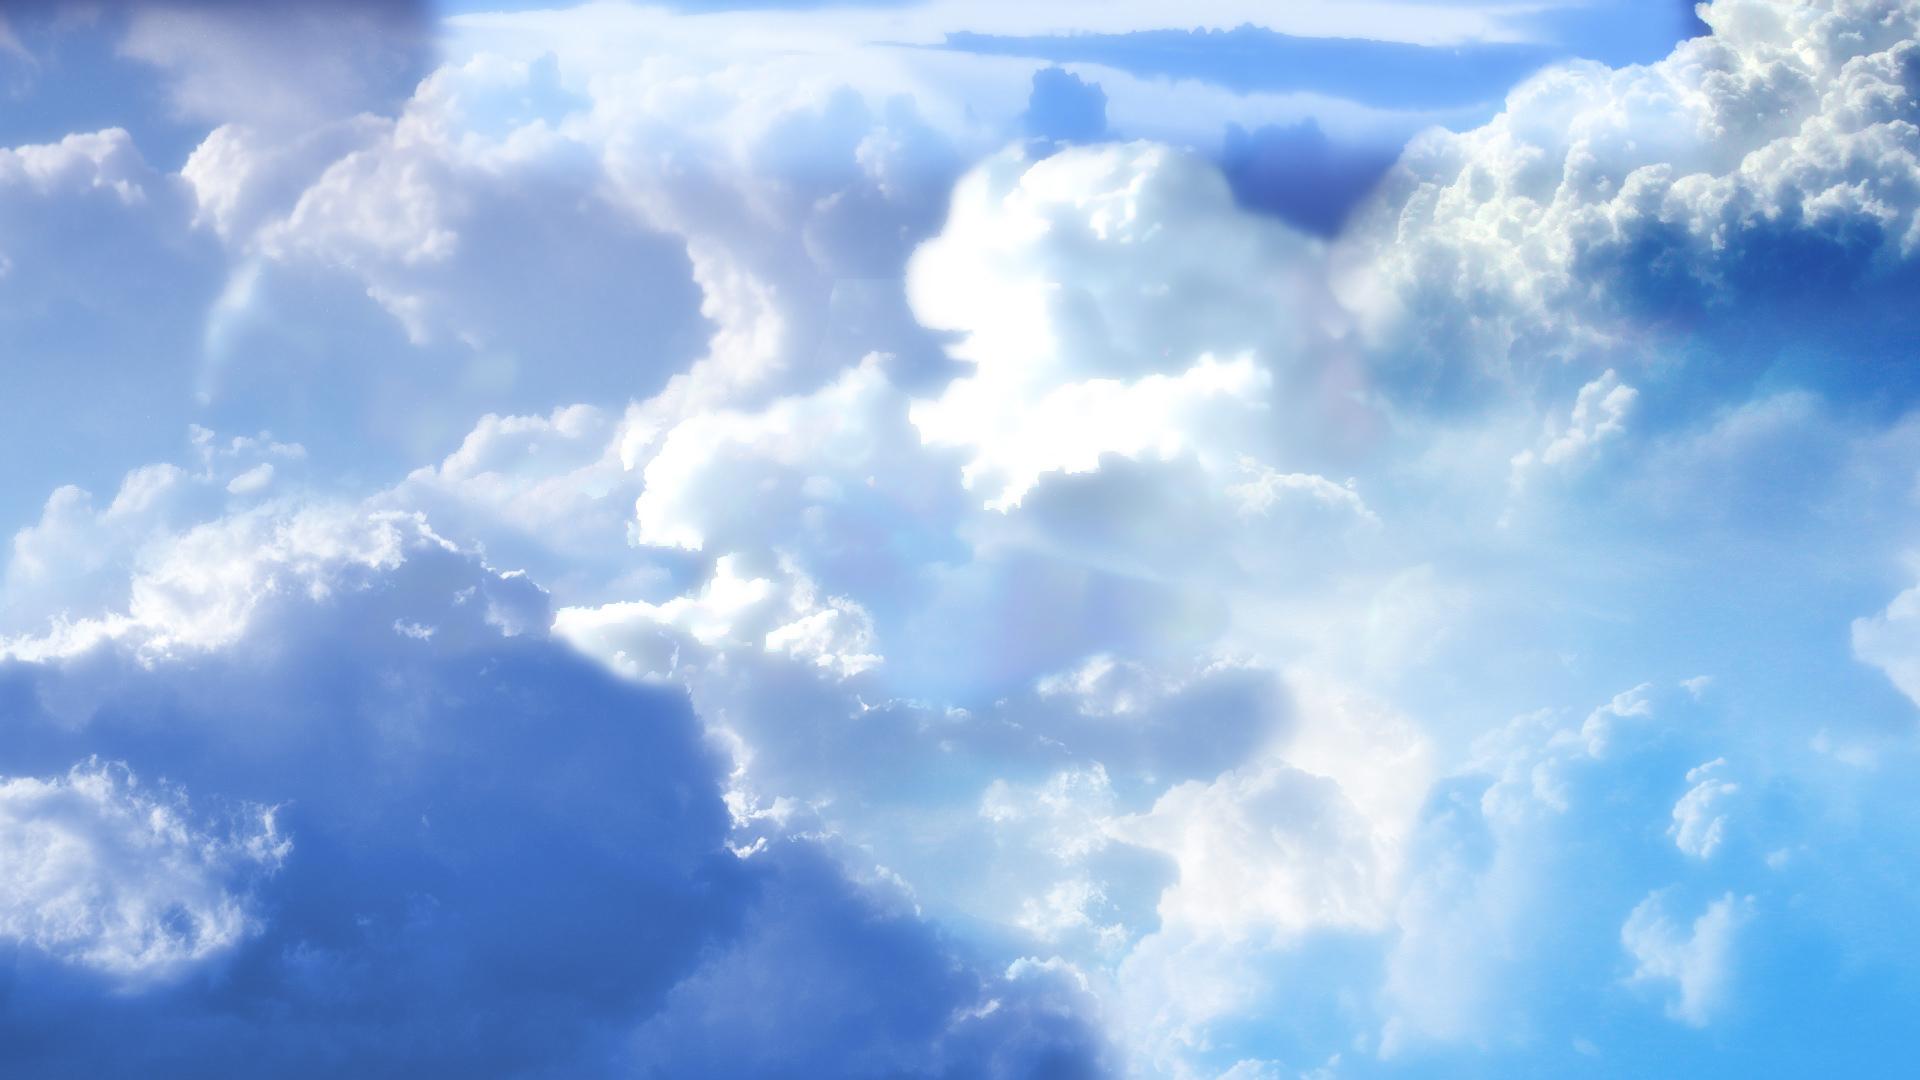 clouds wallpaper – wallpapermonkey com